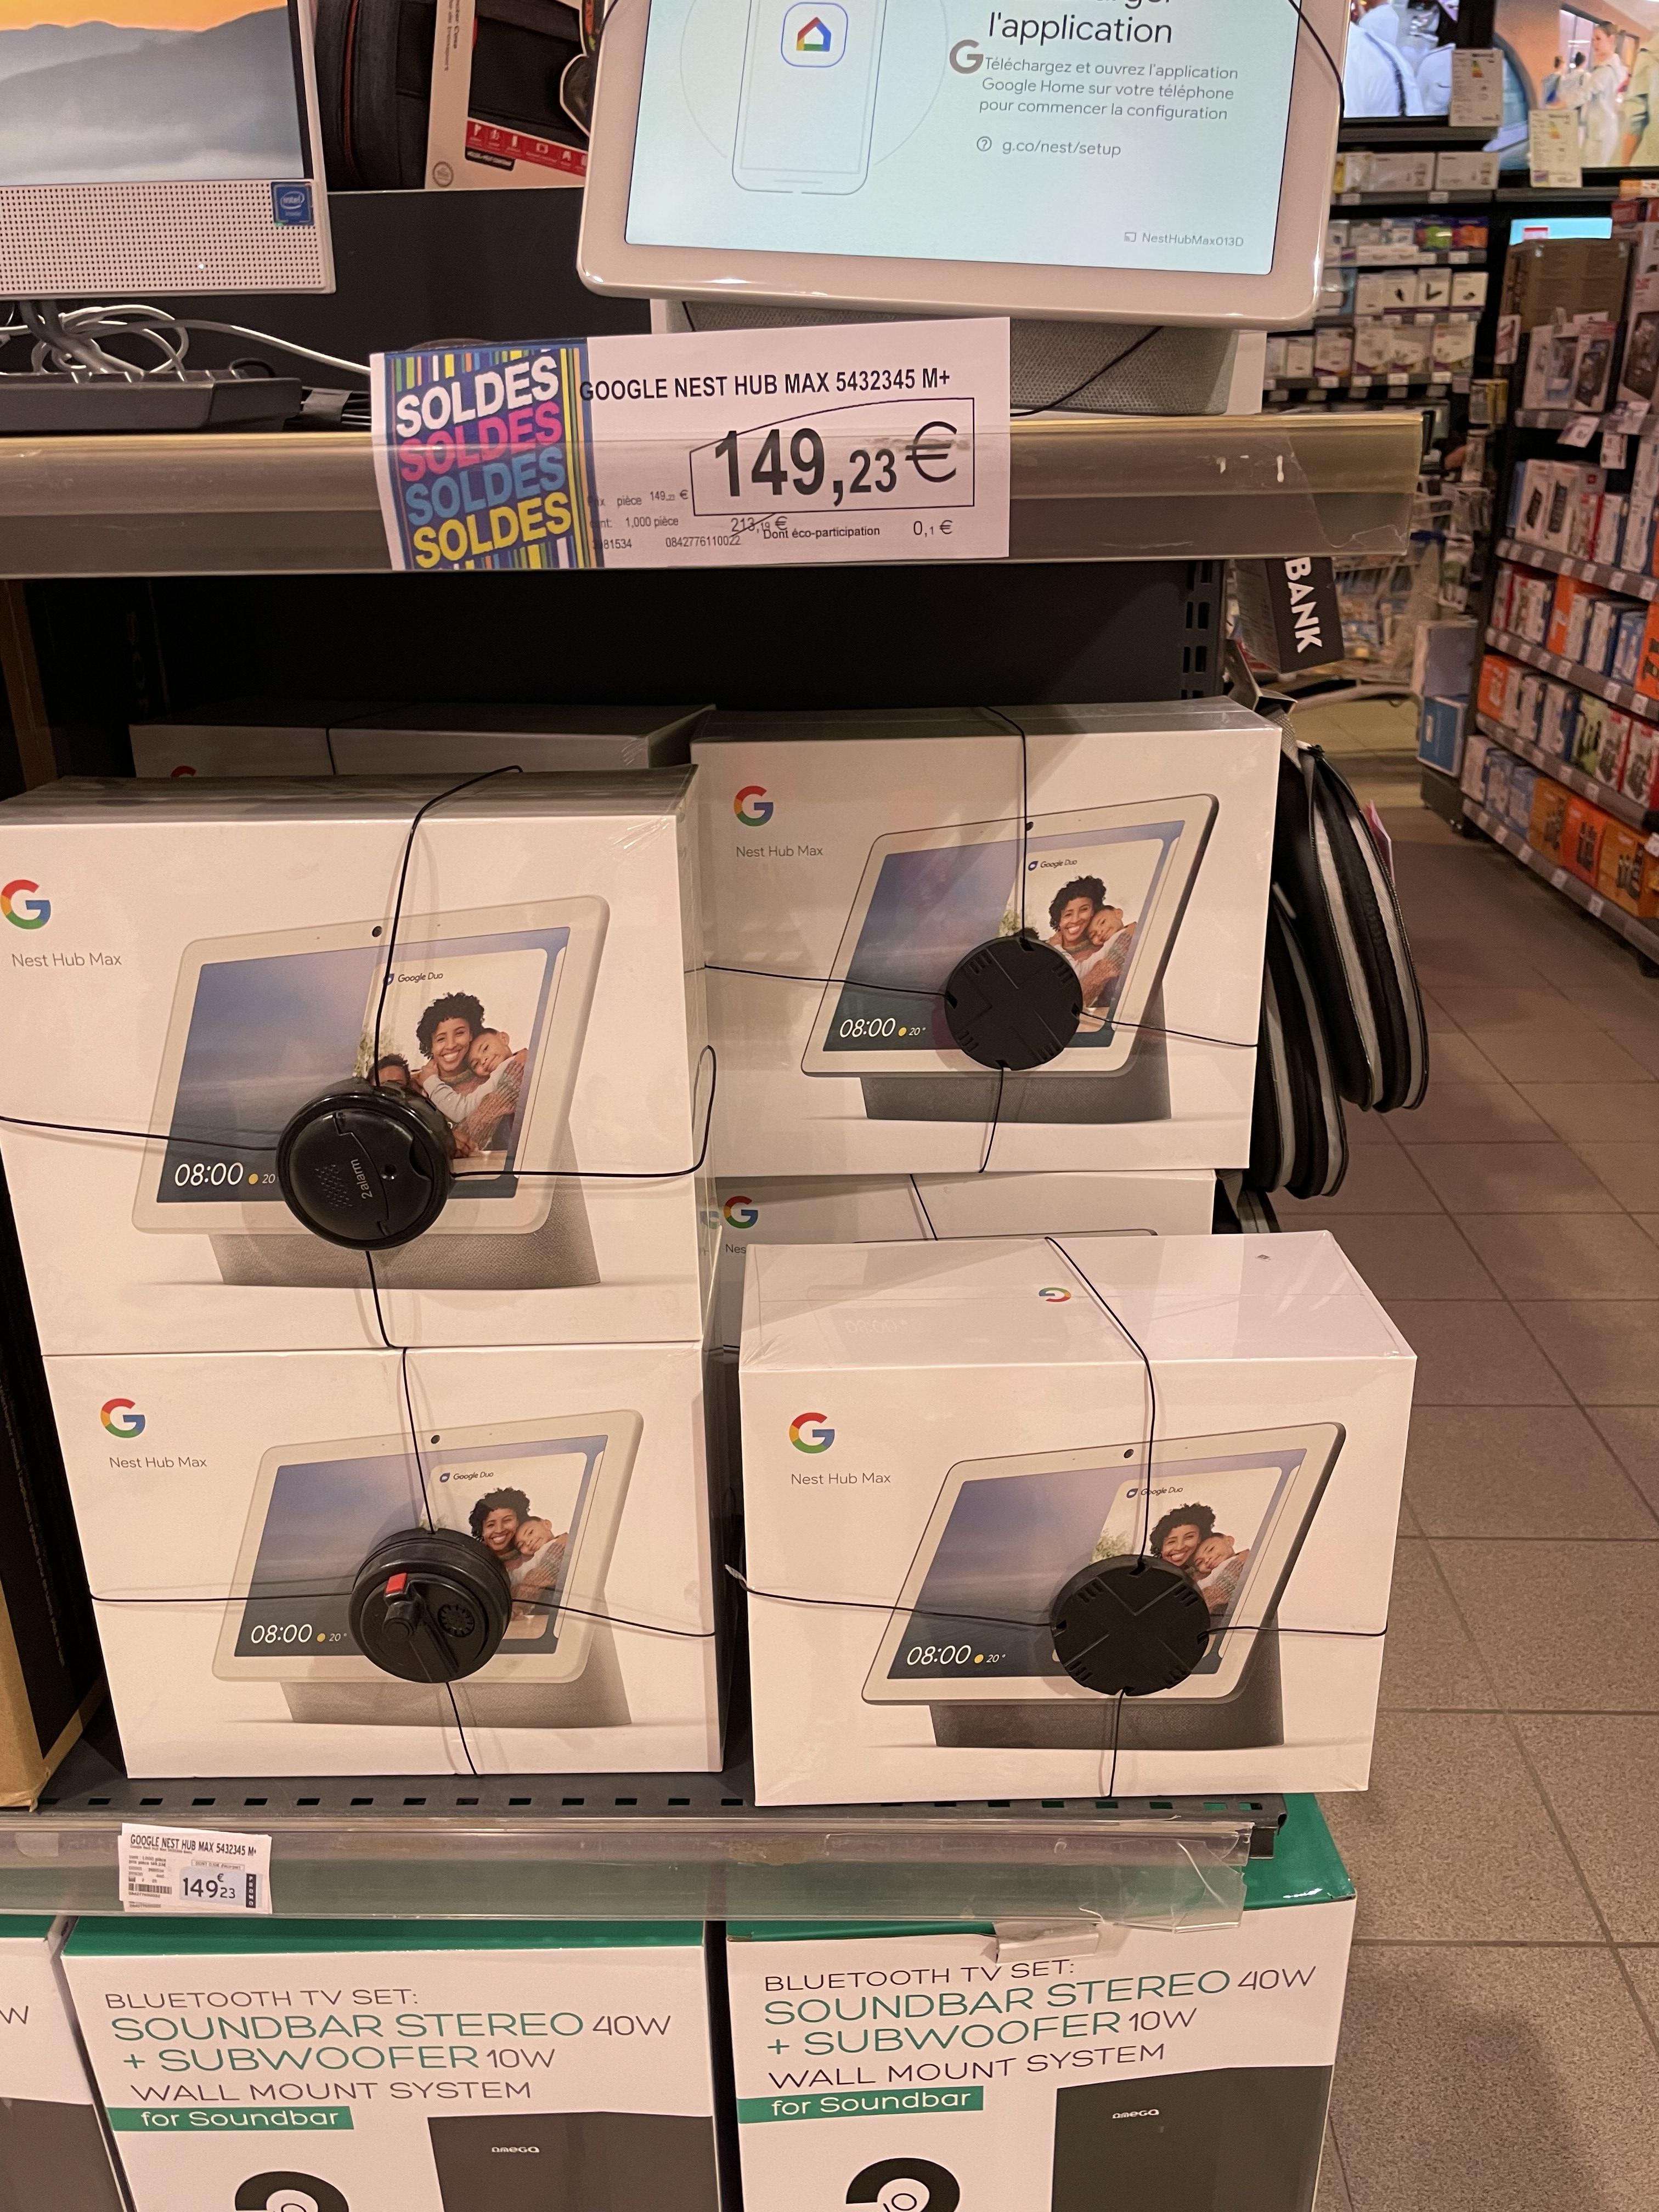 "Enceinte connectée avec écran 10"" Google Nest Hub Max (Colombe 38)"